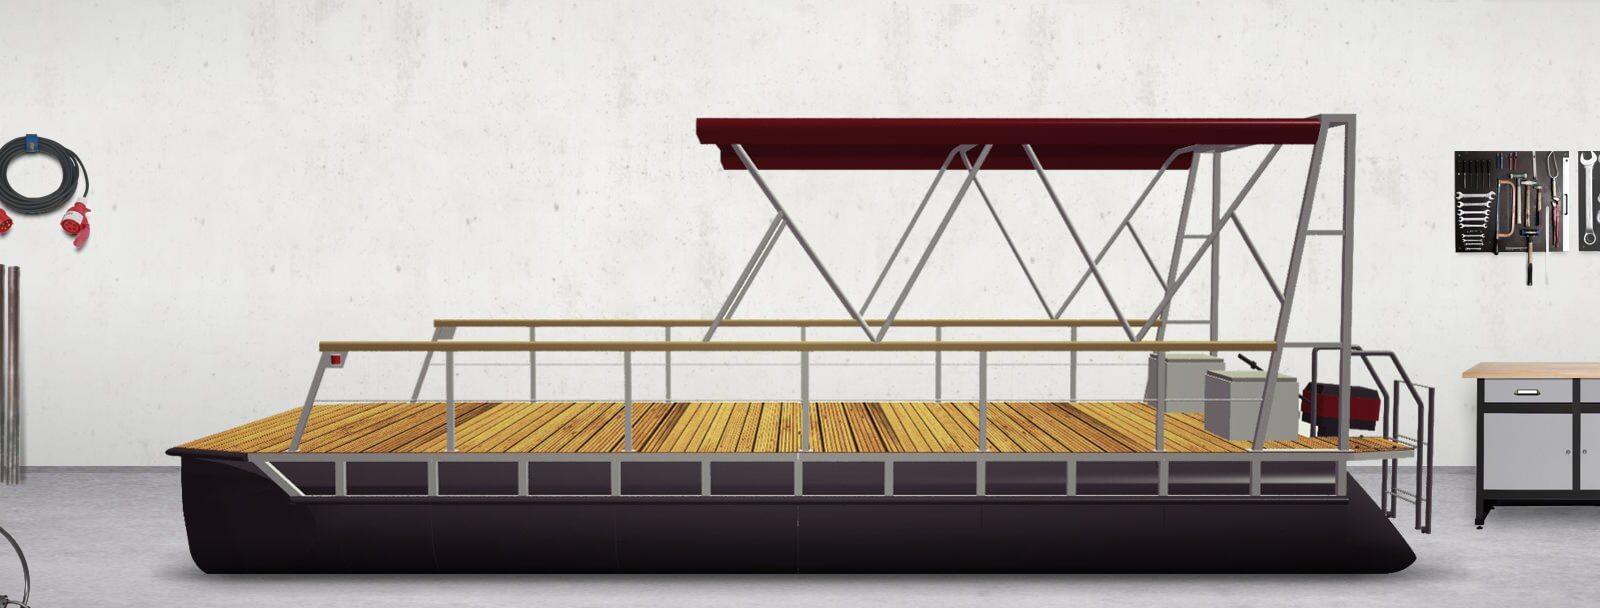 pontoon boat with bimini top